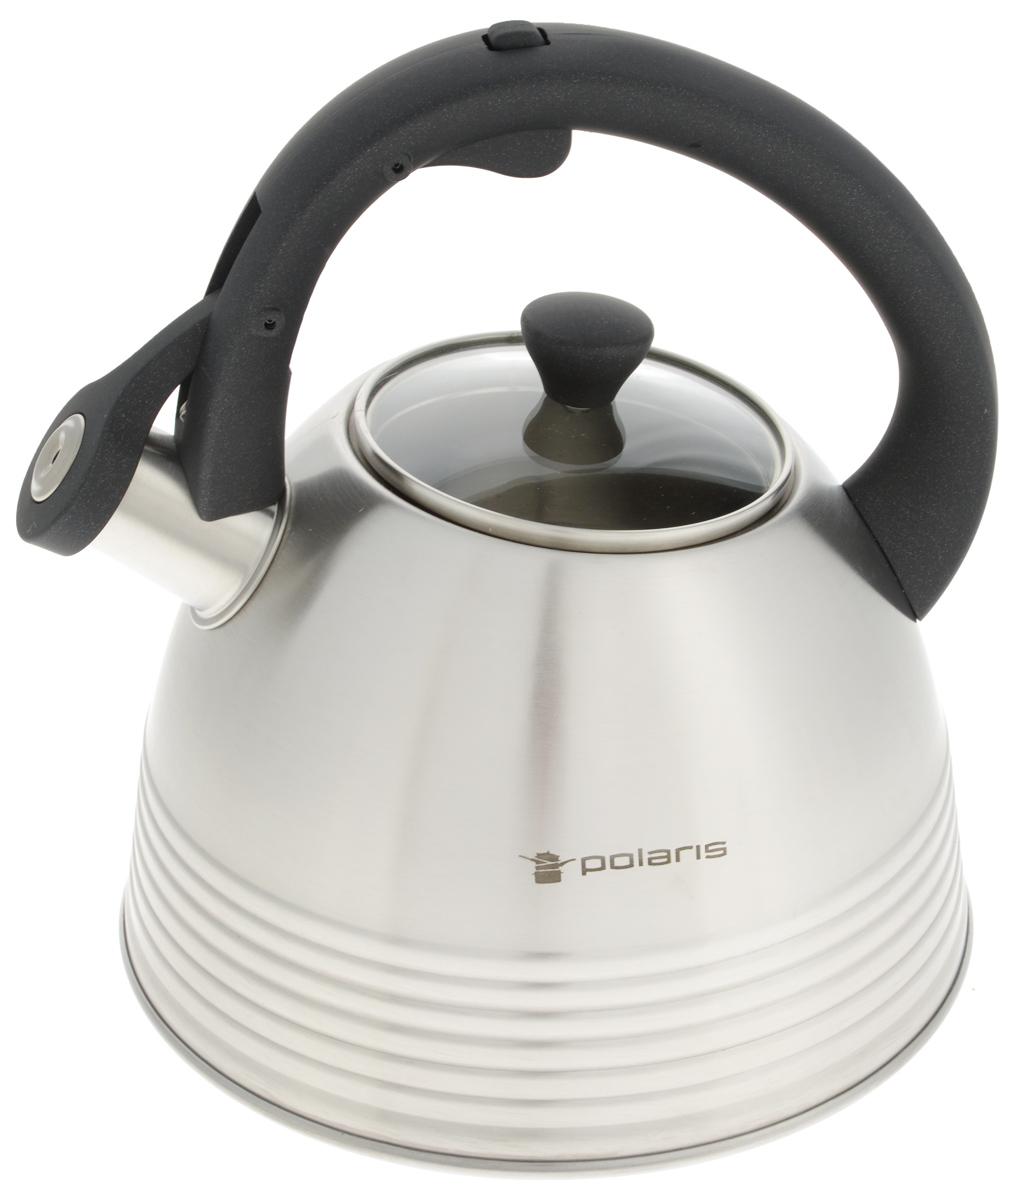 Чайник Polaris Classica, со свистком, 3 л чайник на плиту polaris classica 3l